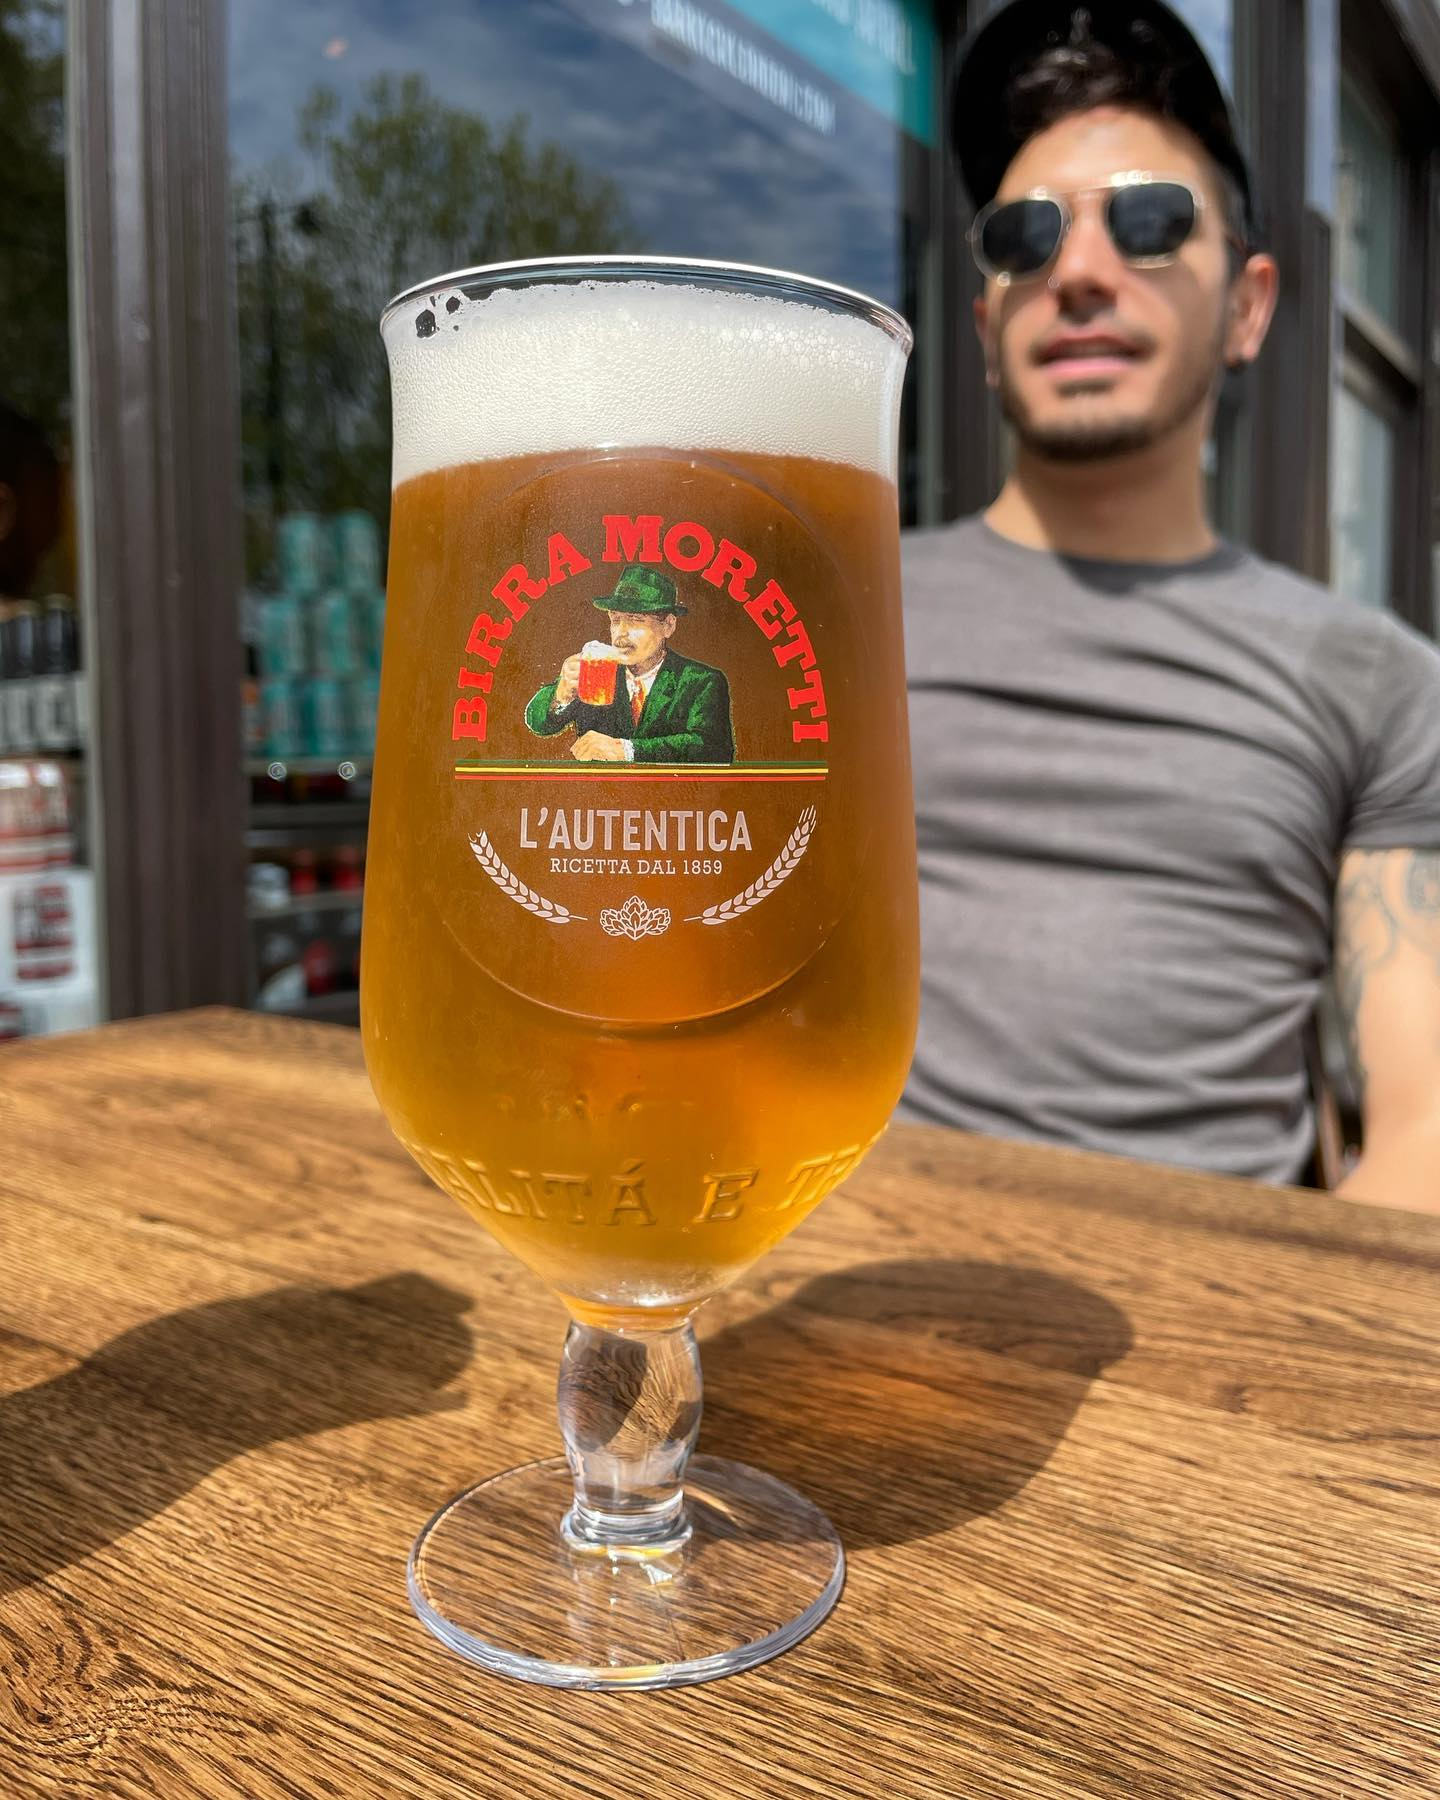 Pint in the sun? 🌞  We'll start it pouring now... 🍺 Open for al fresco beers, cocktails & takeaway pints all day 🙌🏼 . . . . . . . @birramorettiuk @birramoretti #moretti #beer #beerstagram #beersofinstagram #italian #boozer #pub #outdoor #terrace #pint #birramorertti #summer #finally #sunshine #barkick #shoreditch